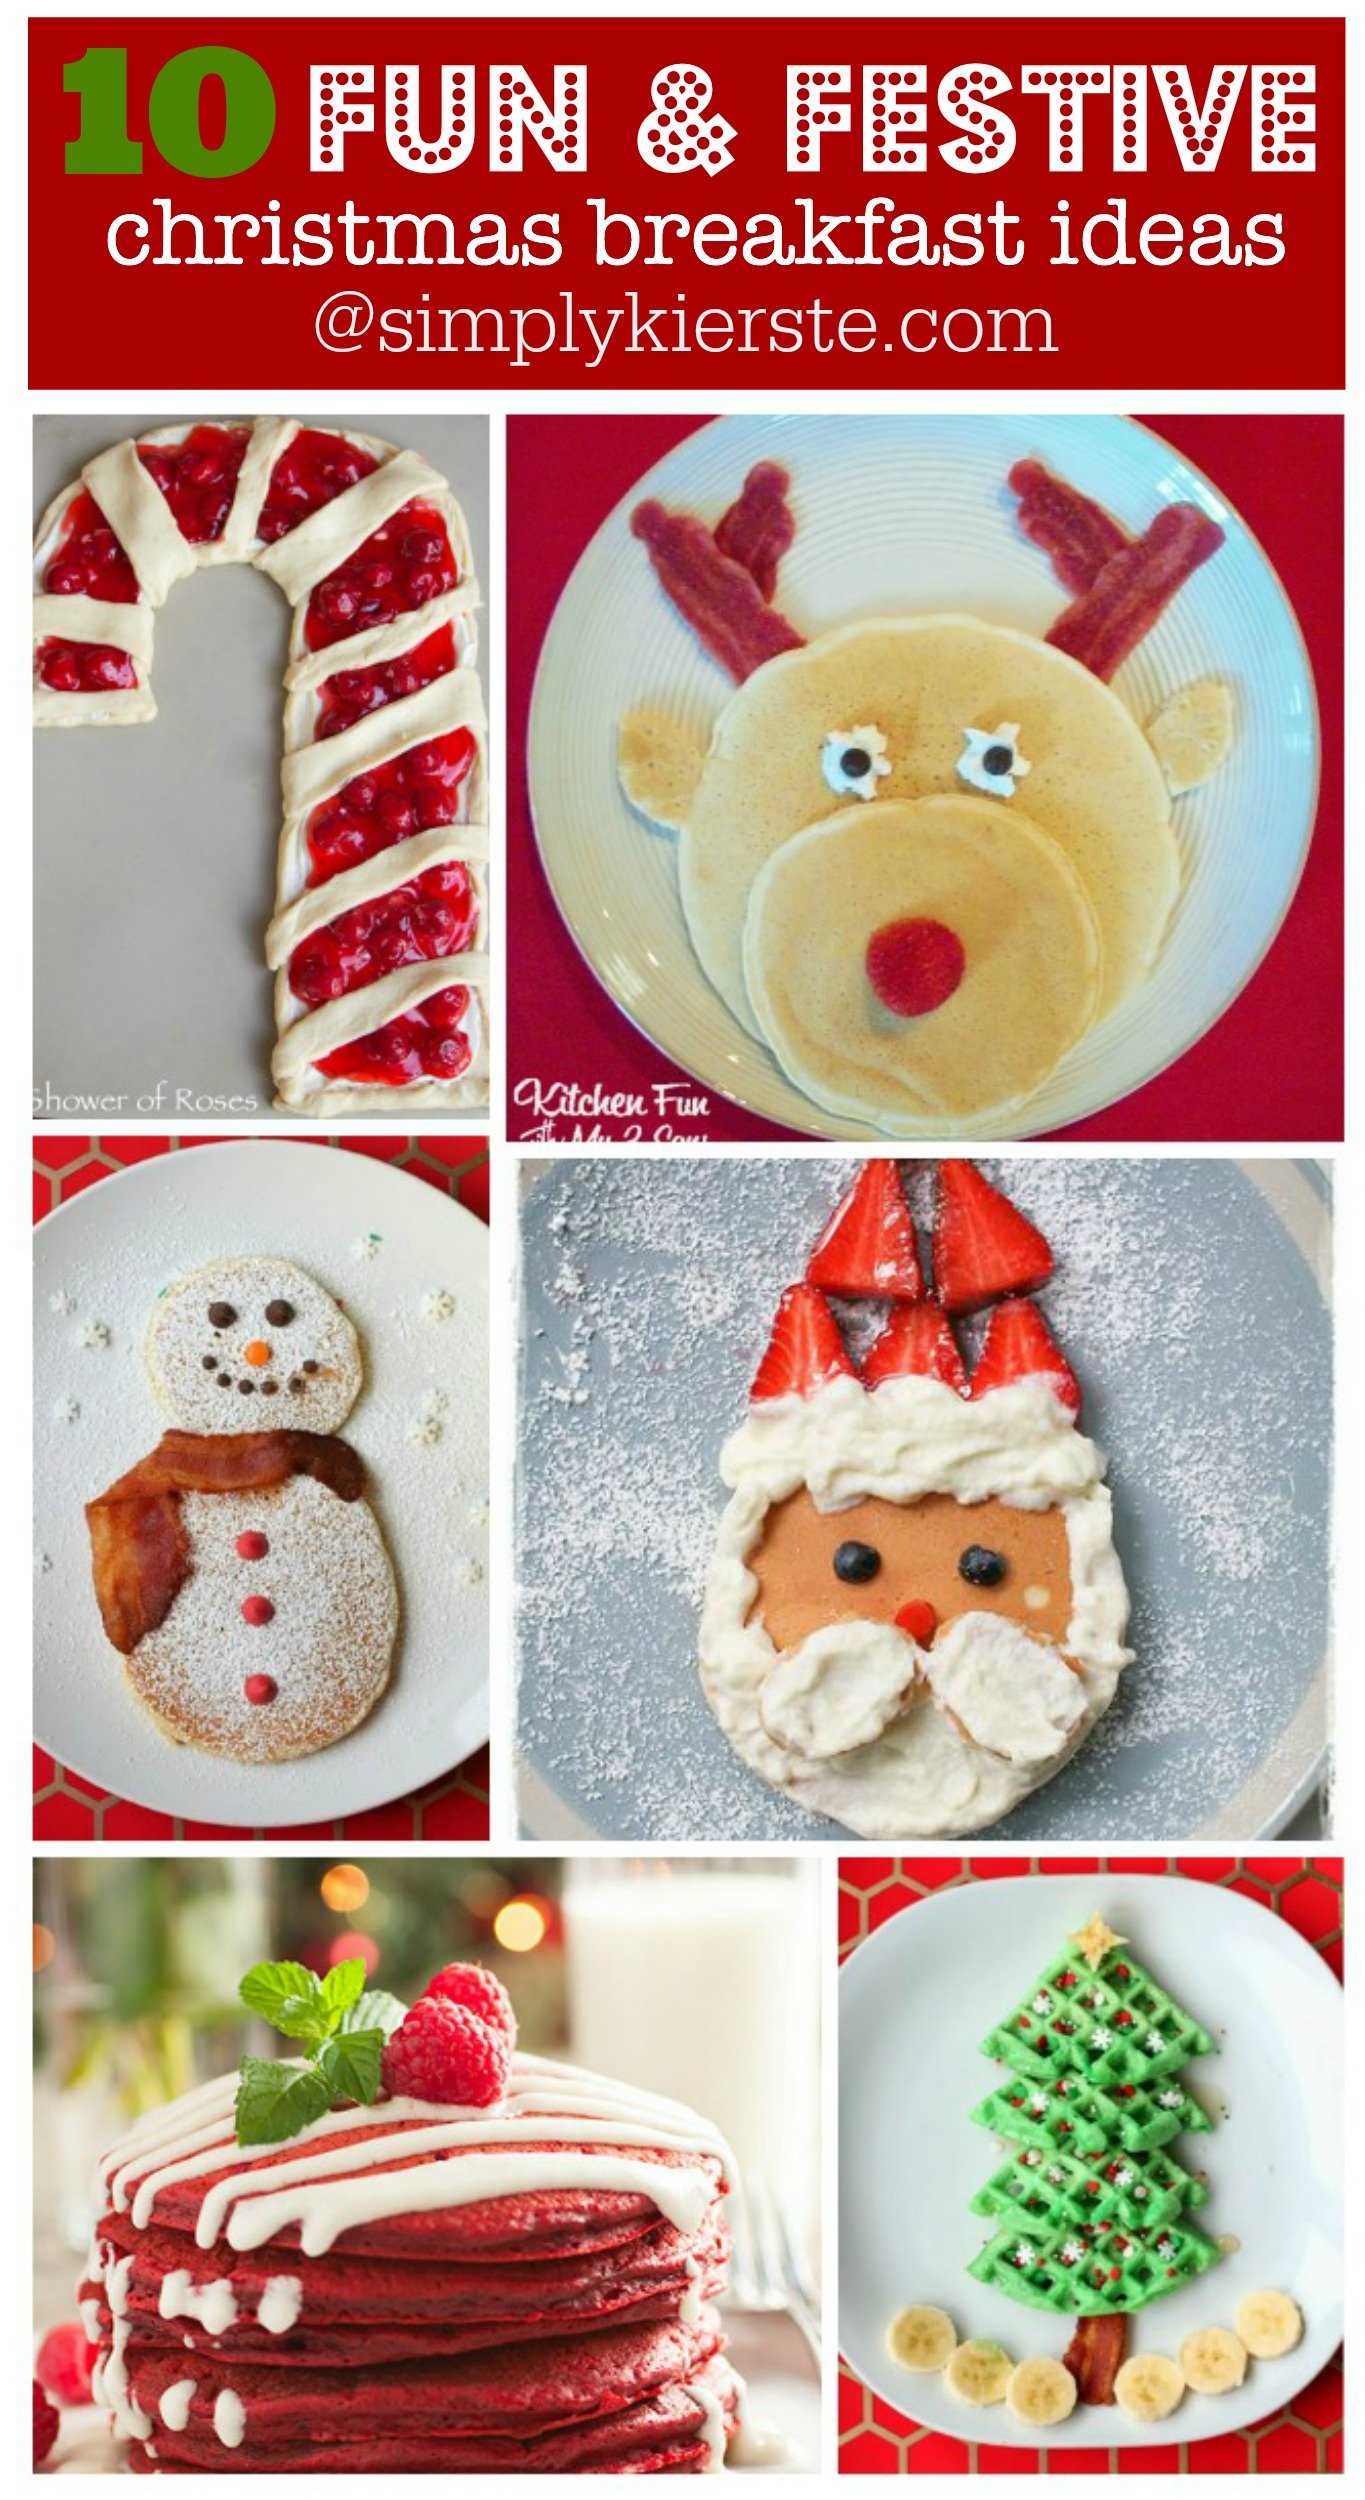 10 Fun & festive Christmas breakfast ideas